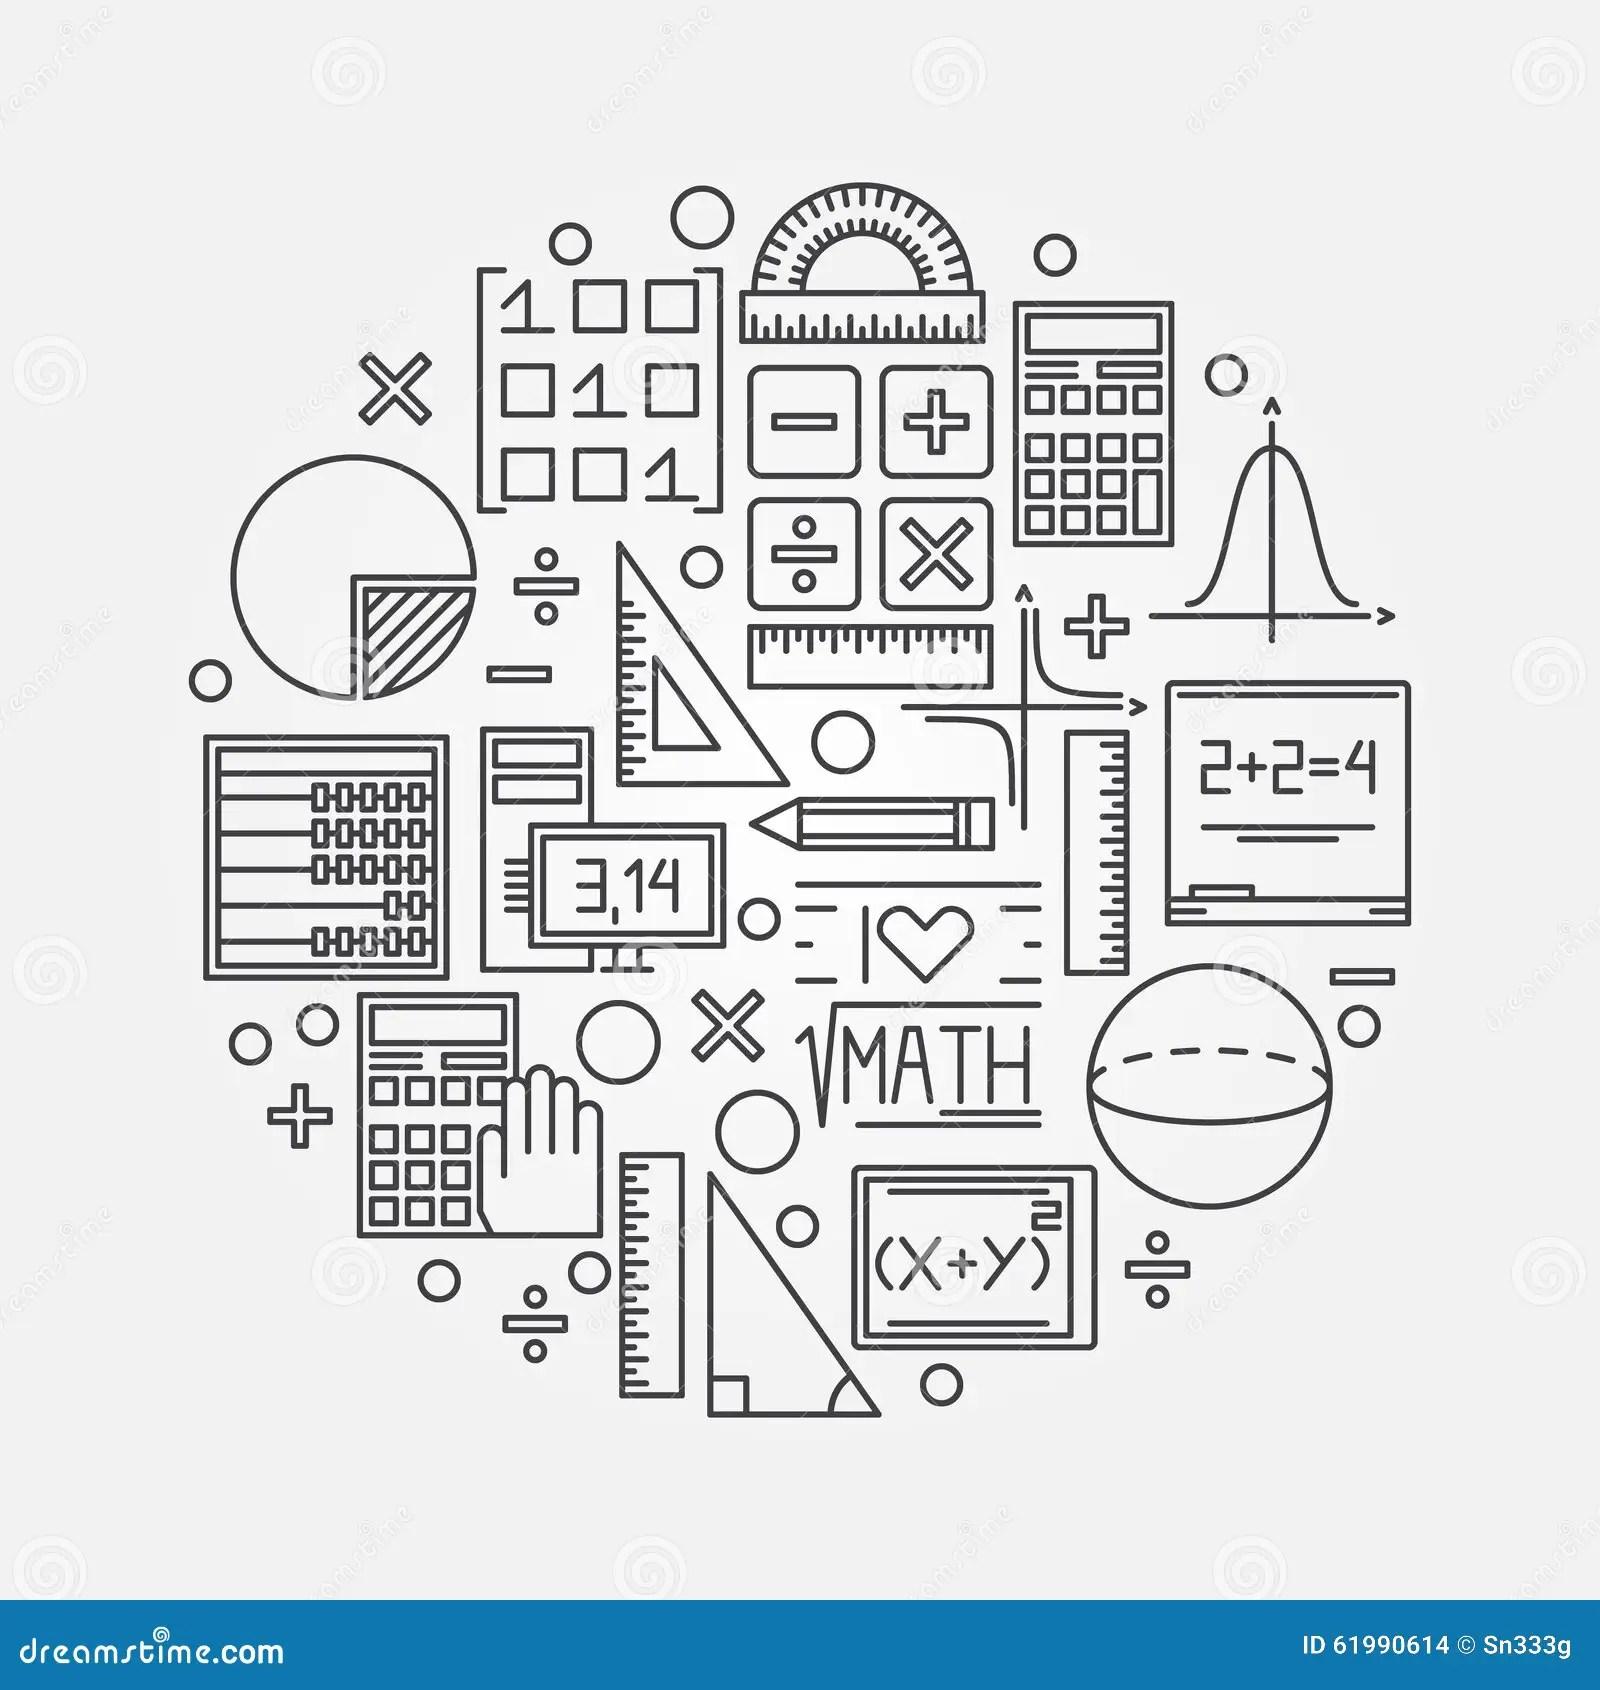 Math Linear Illustration Stock Vector Illustration Of Math